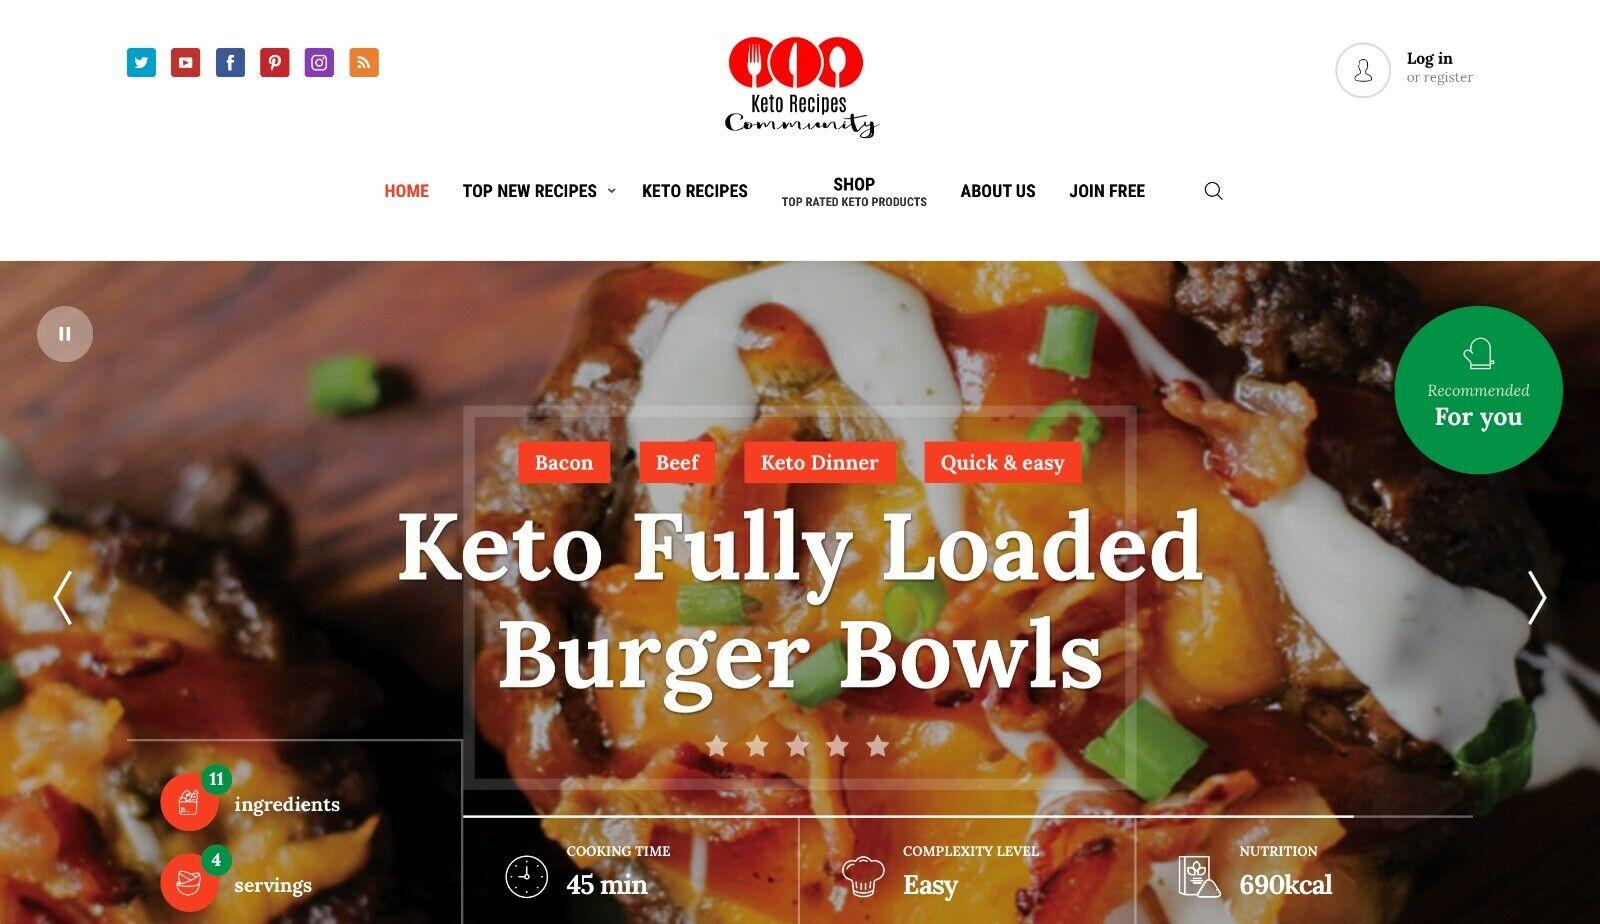 Keto Diet Recipe Community - Gorgeous Design - Unique Affiliate Turnkey Business